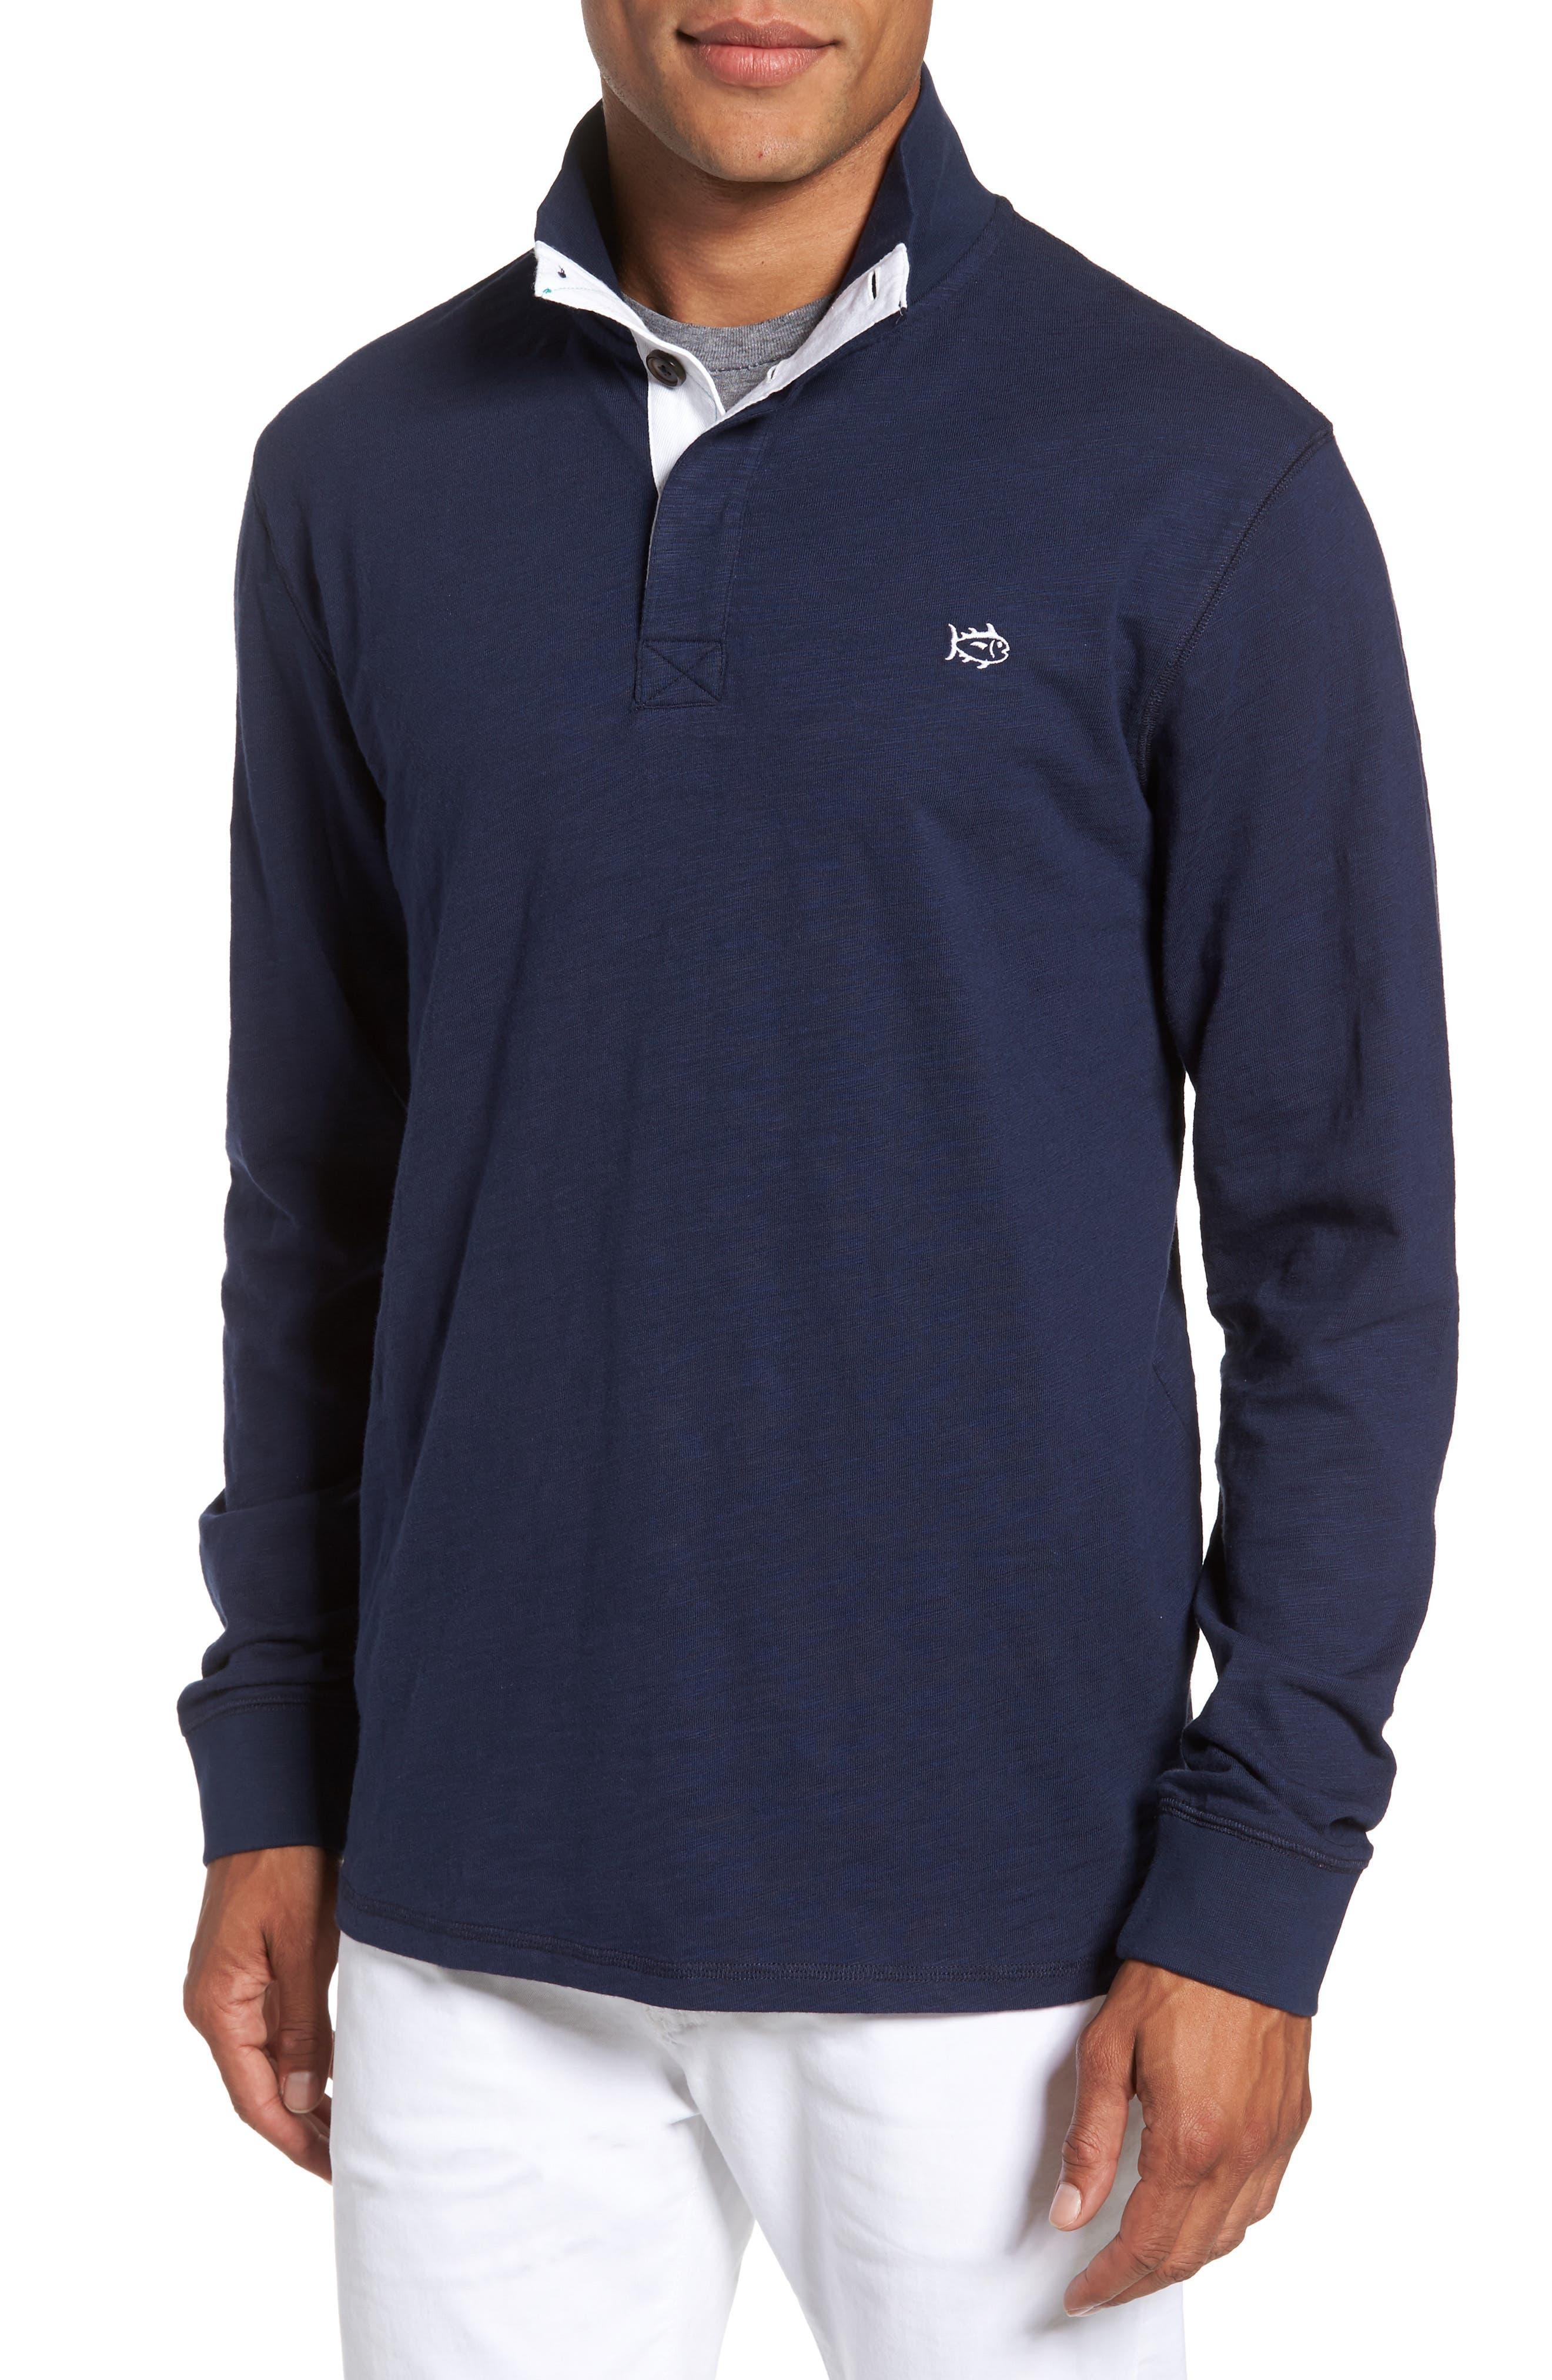 Gulf Stream Sweatshirt,                             Main thumbnail 1, color,                             408